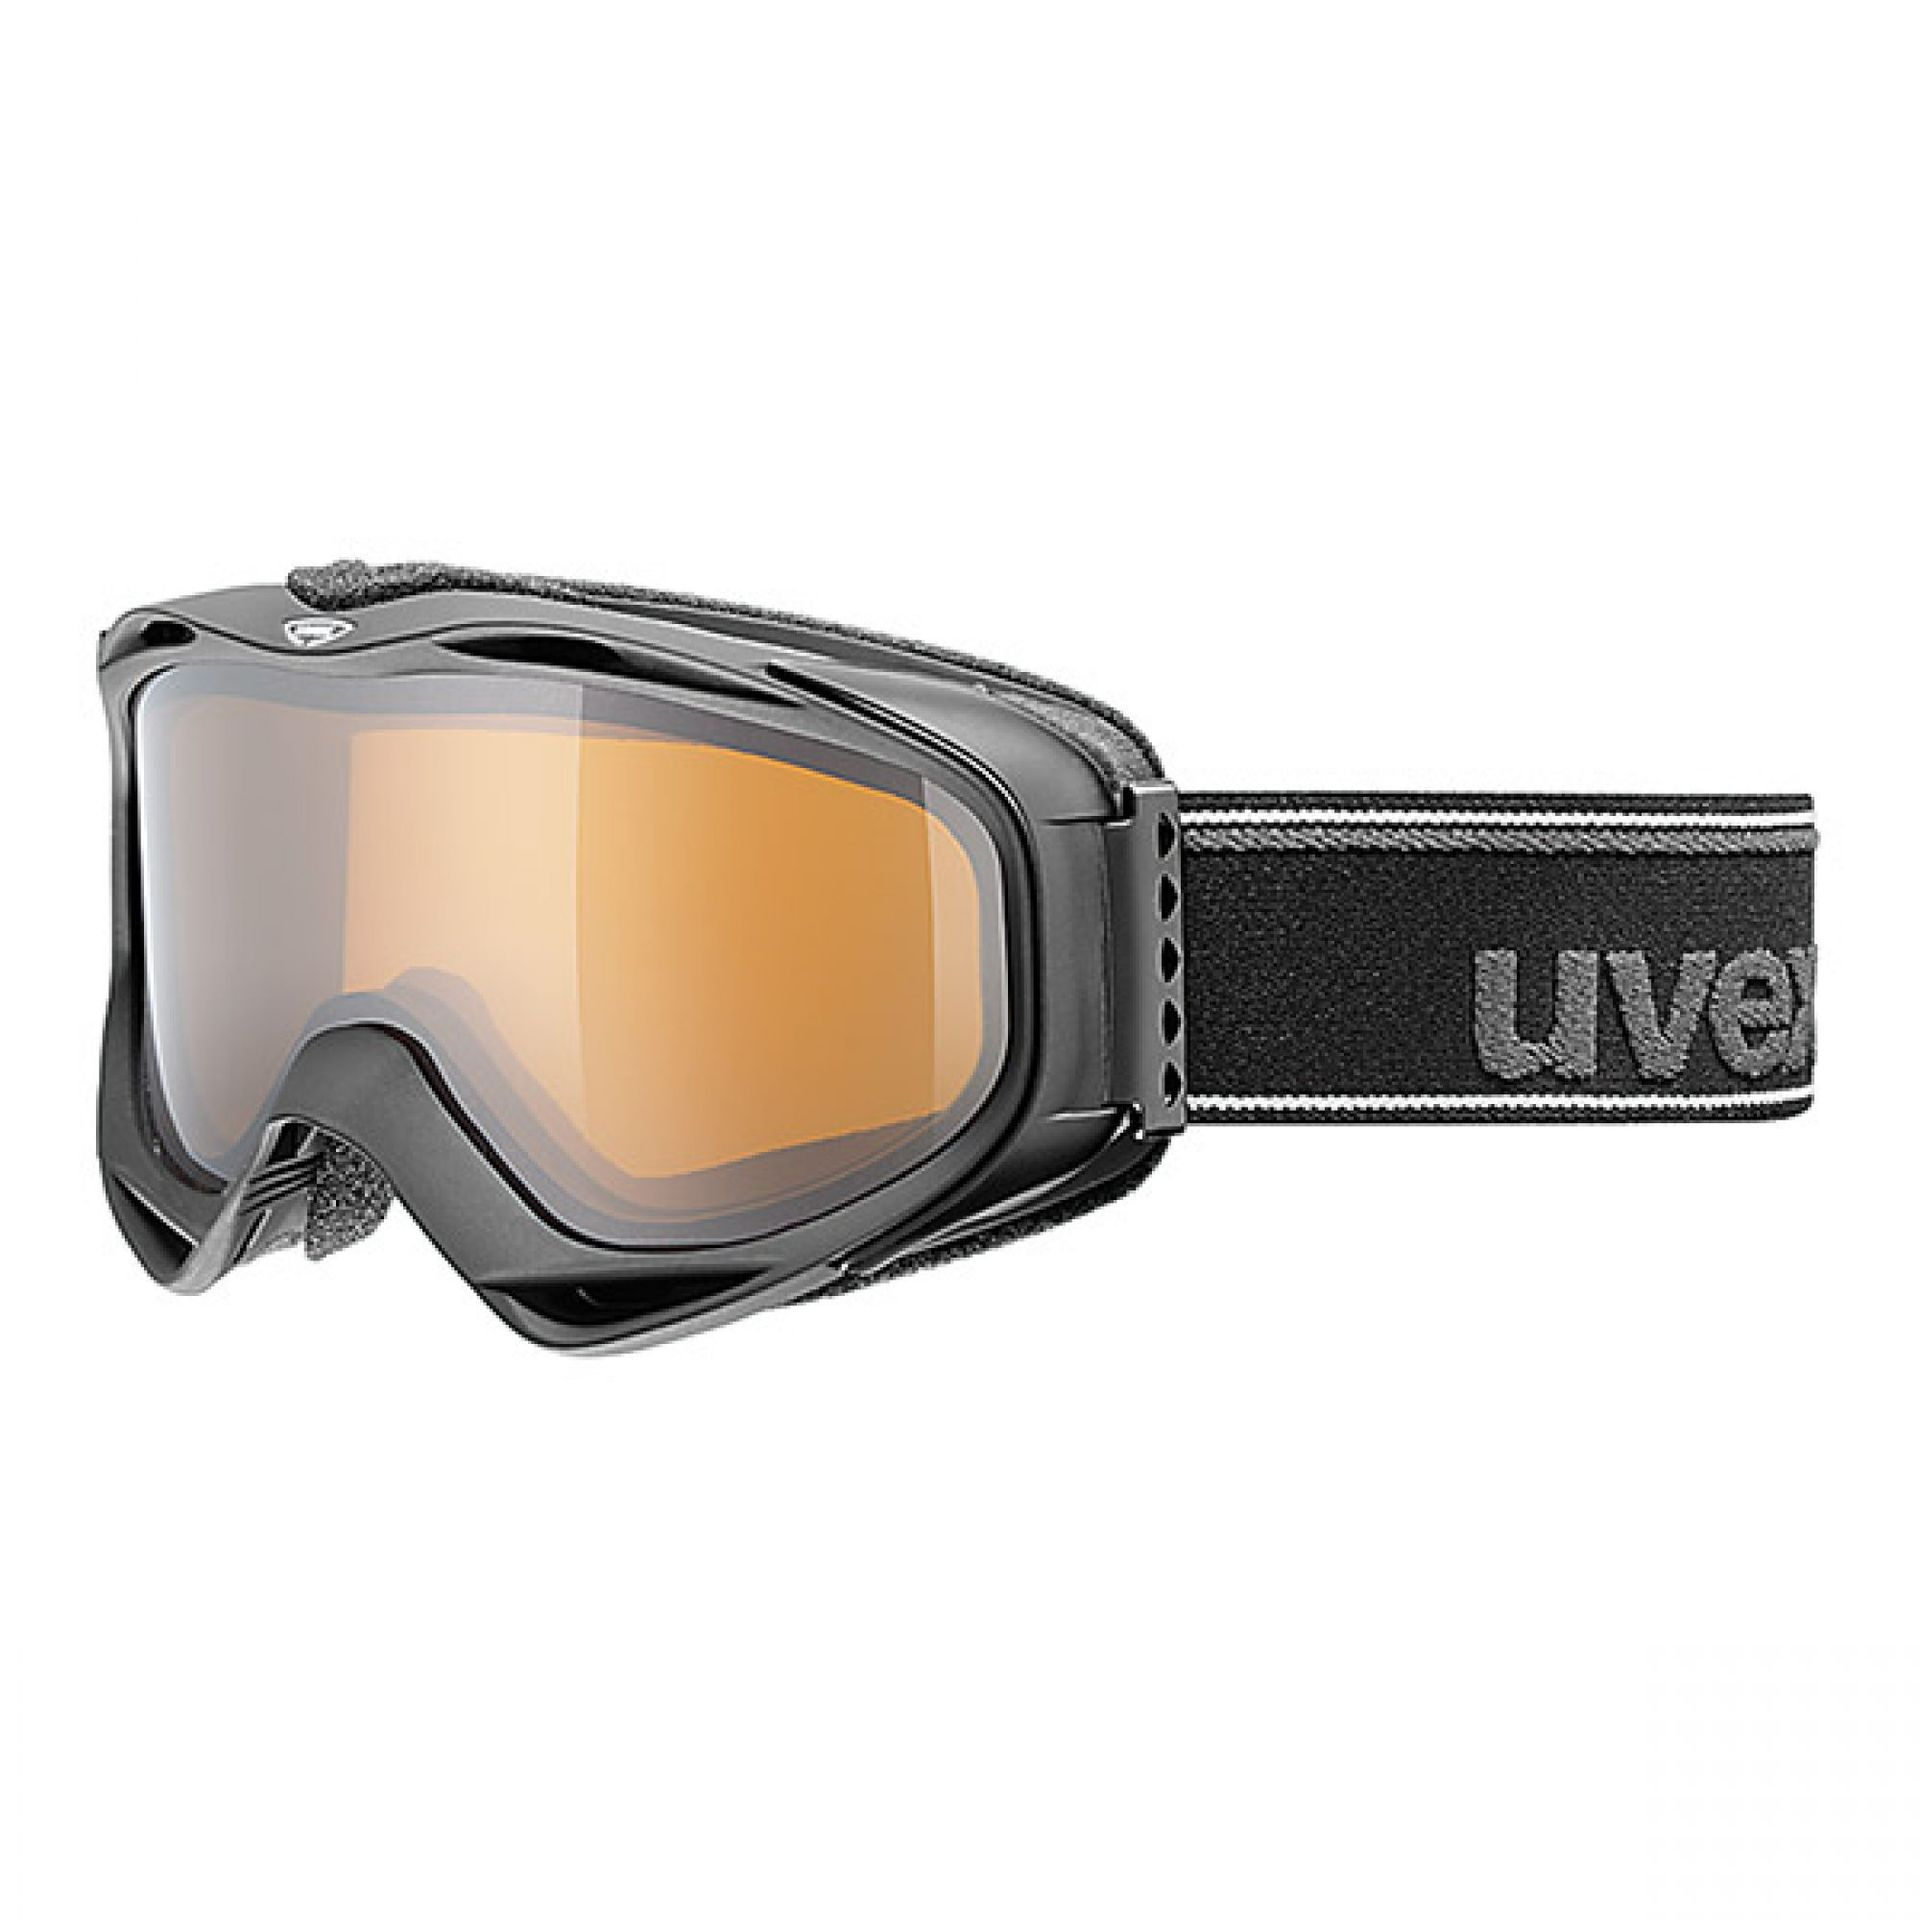 GOGLE UVEX G.GL 300 POLA BLACK MAT POLAVISION CLEAR S2